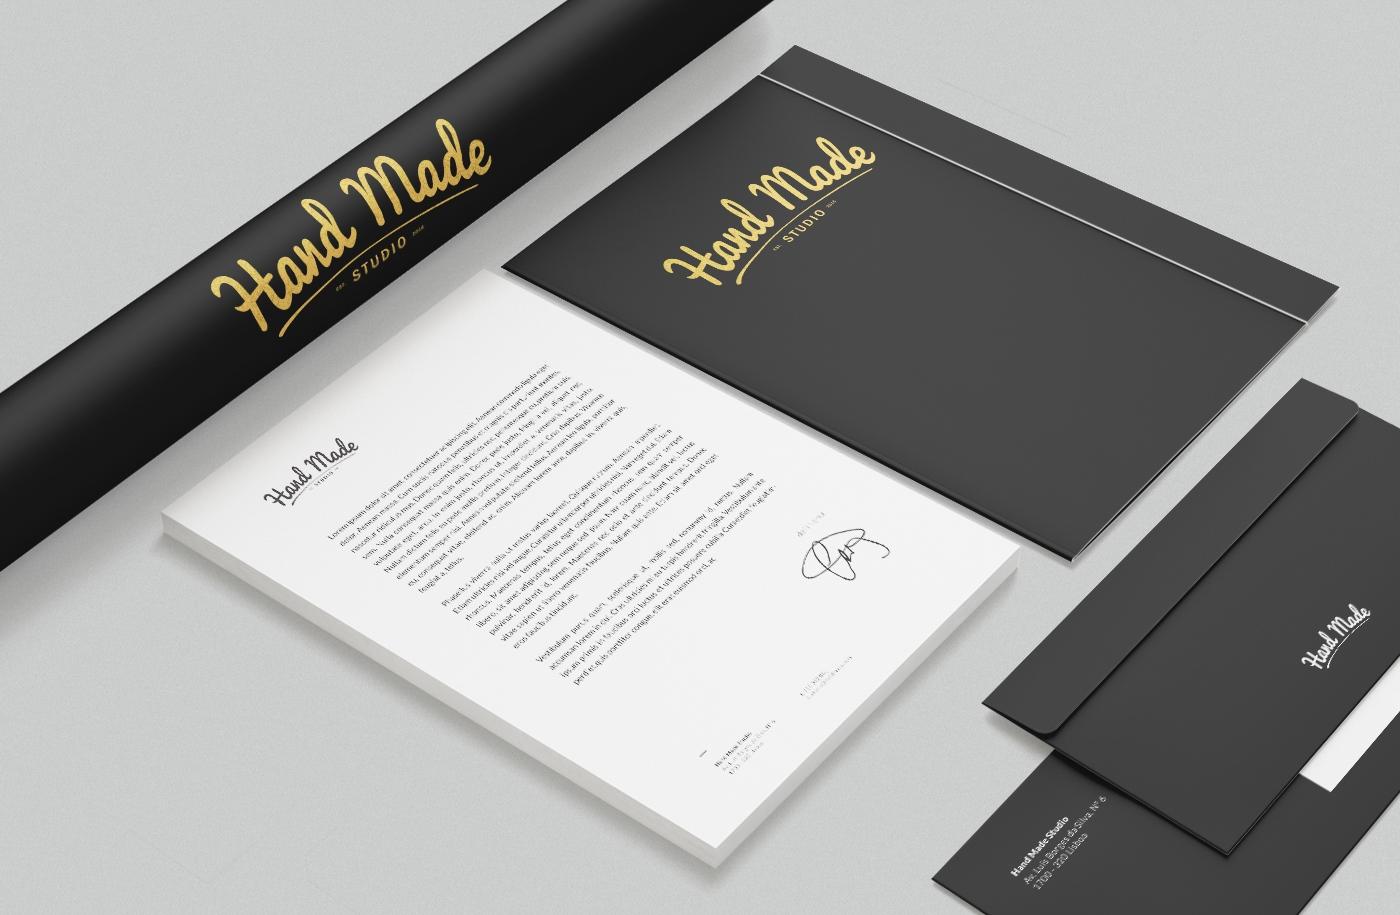 hand made studio is a graphic design studio